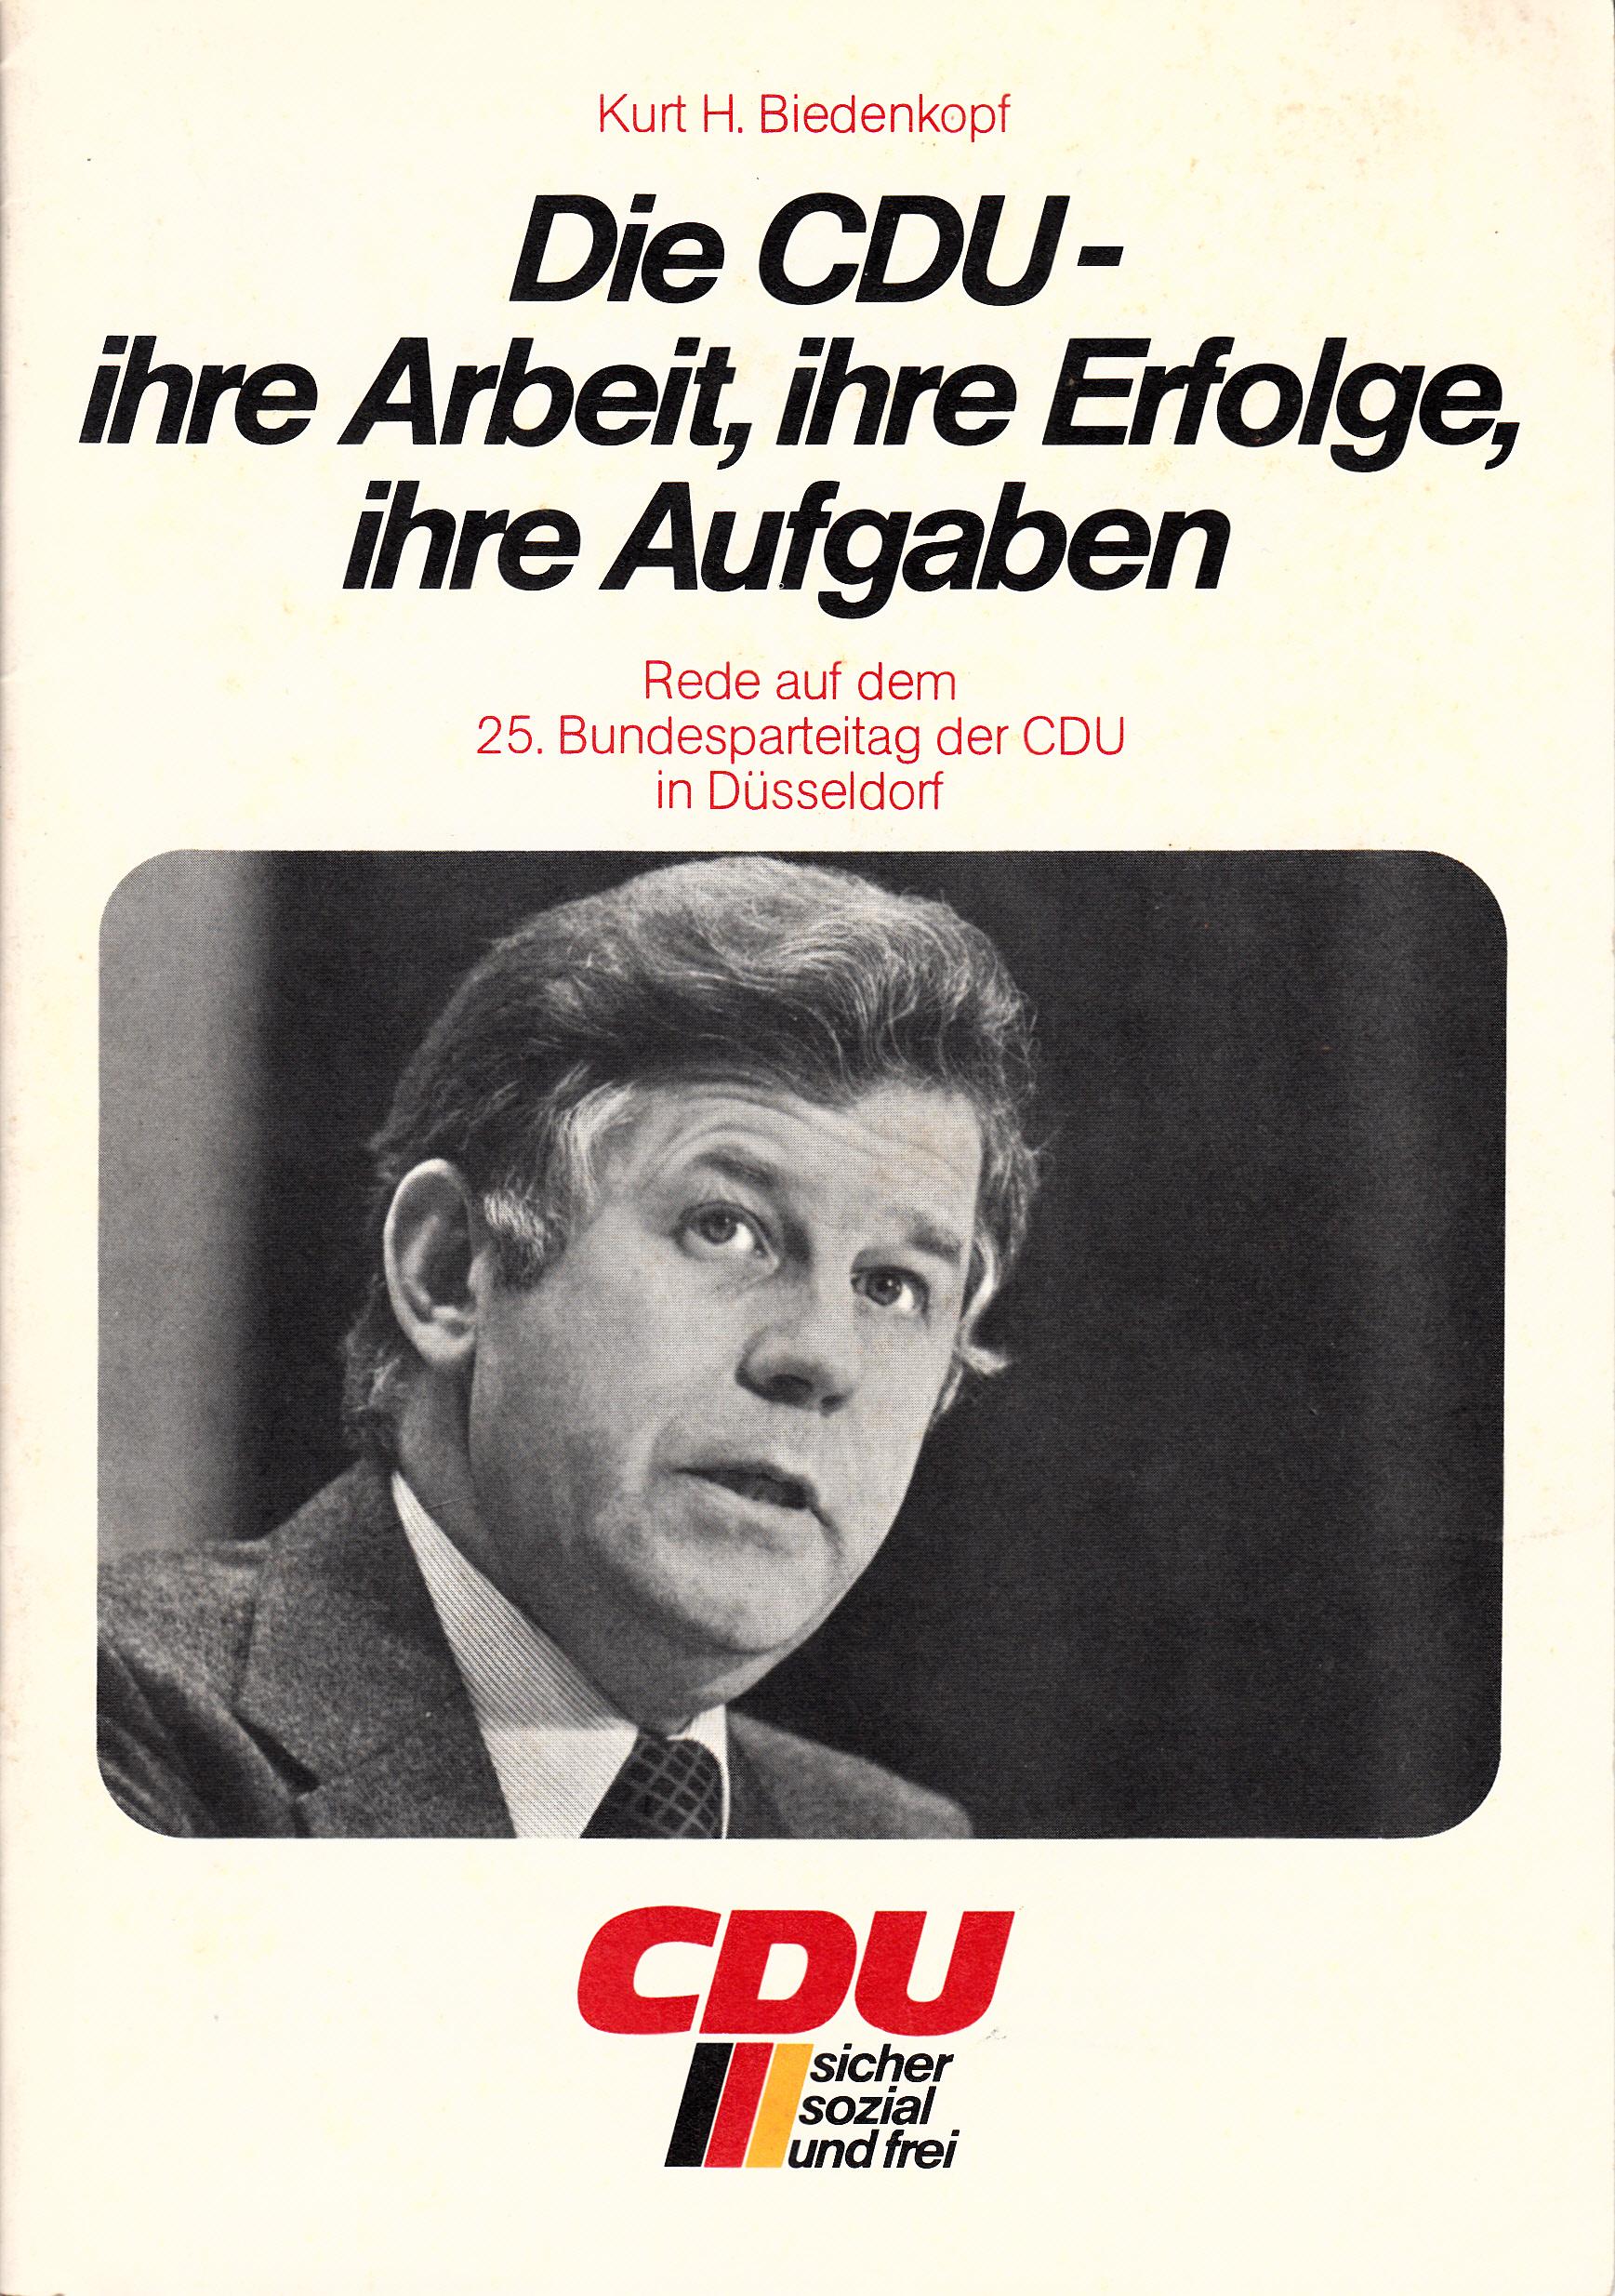 CDU_alemanha_0002